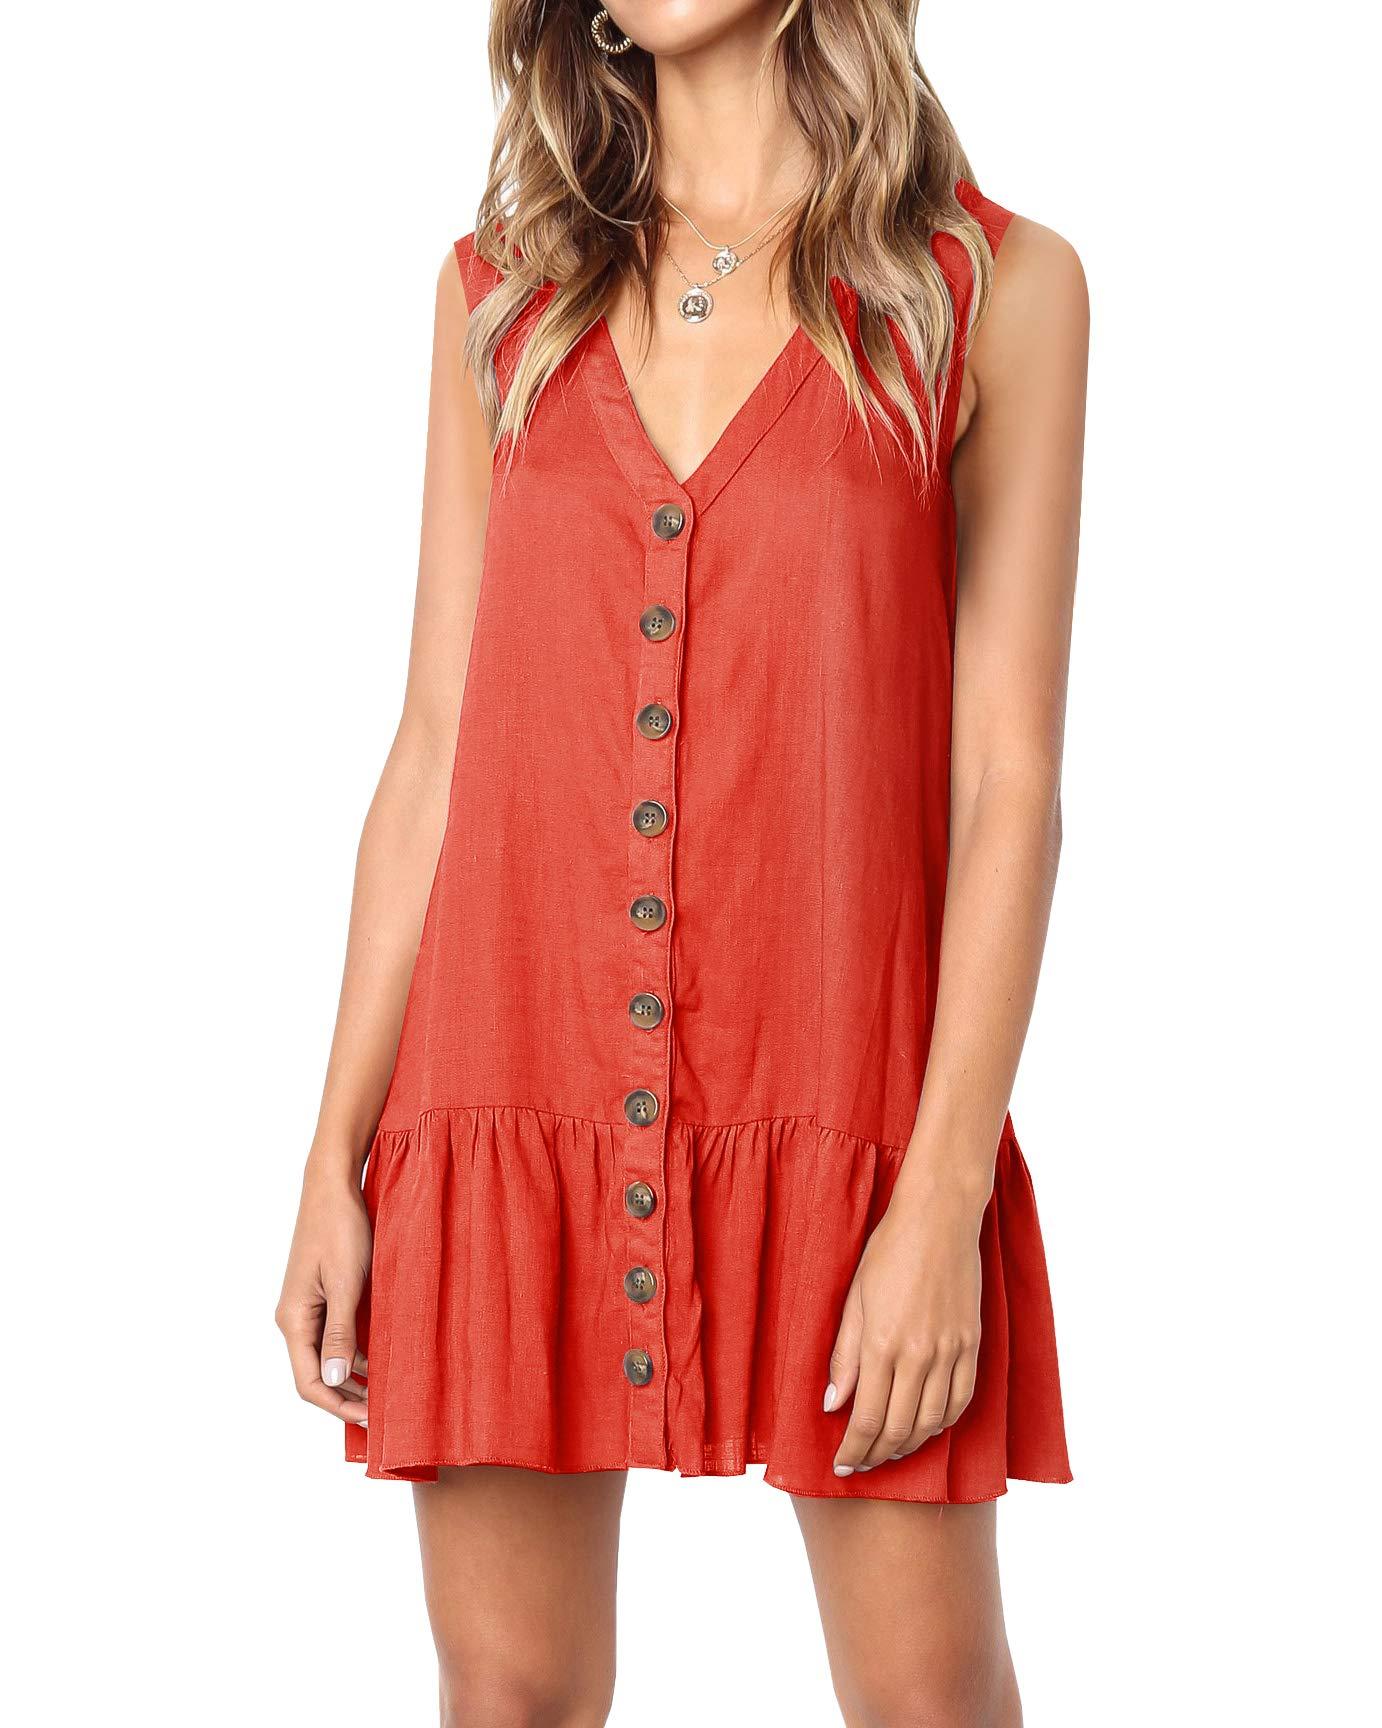 Available at Amazon: Imysty Women's Polka Dot V Neck Button Down Ruffles Loose Mini Short T-Shirt Dress